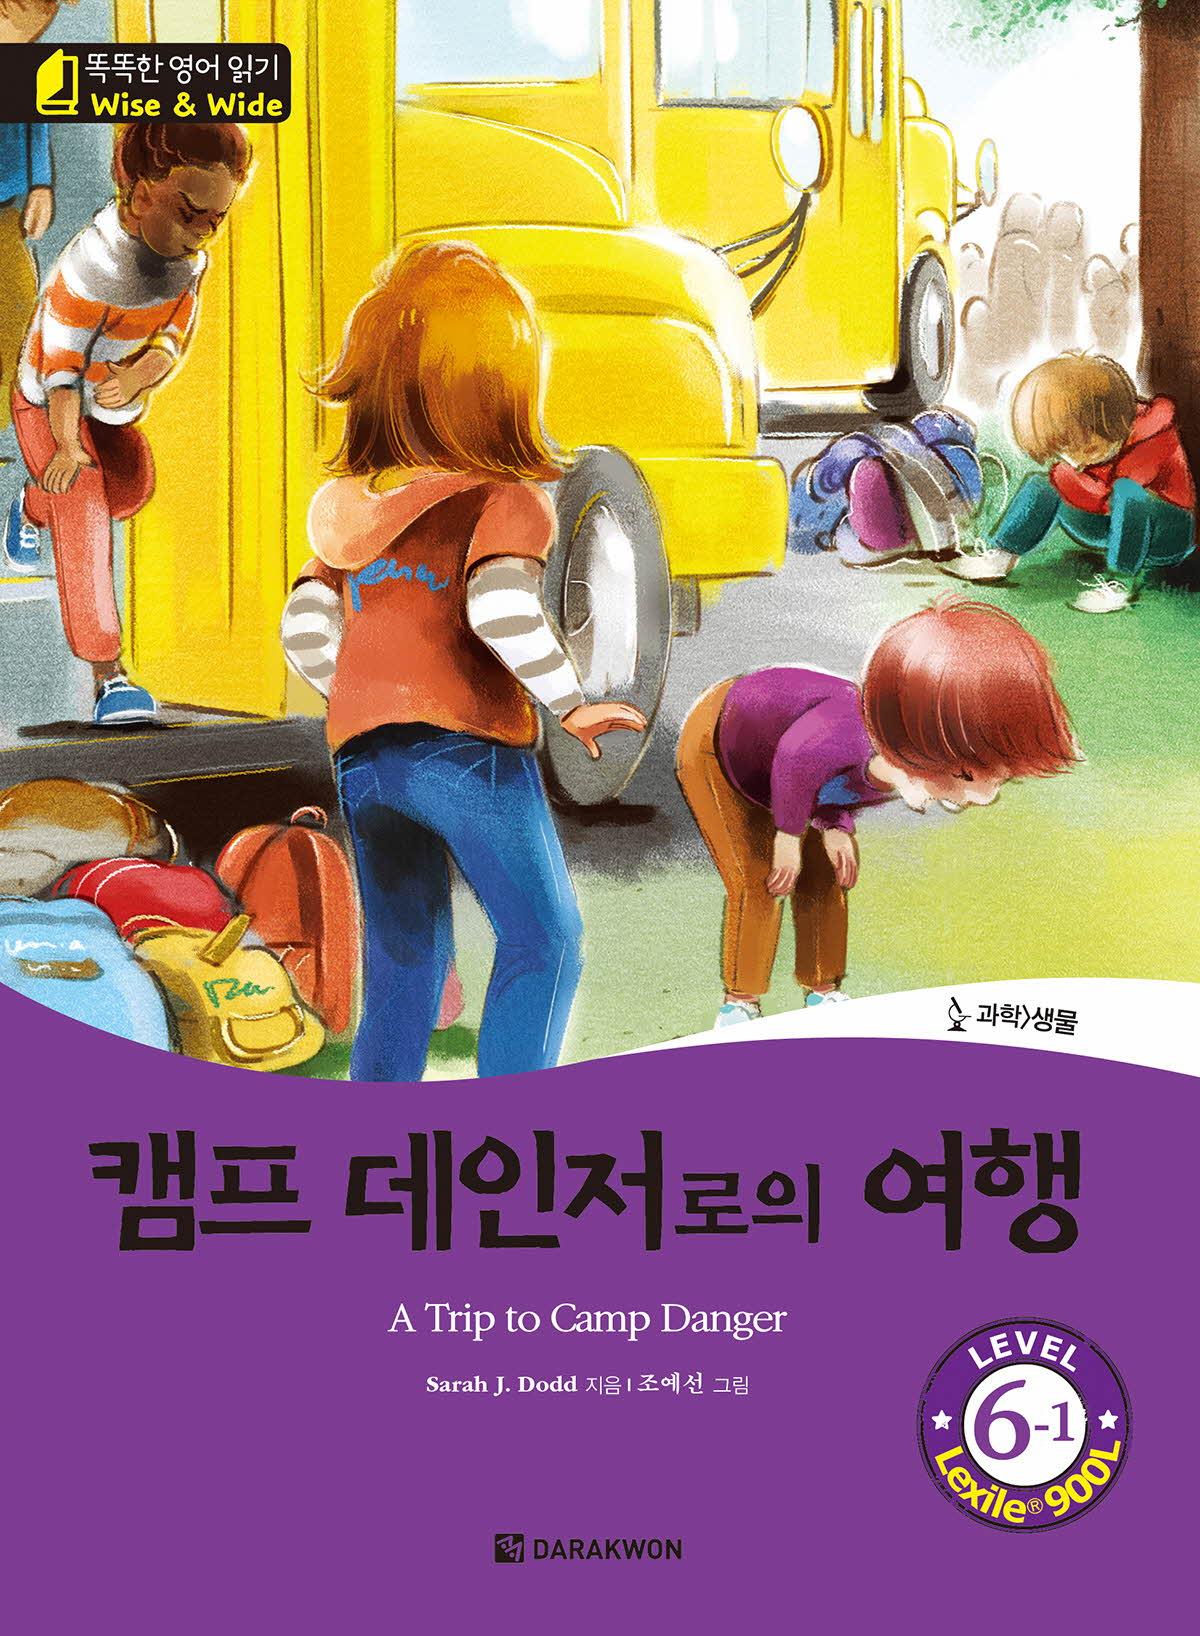 <a href='contents.php?CS_CODE=CS201803120051'>캠프 데인저로의 여행 (A Trip to Camp Danger)</a> 책표지